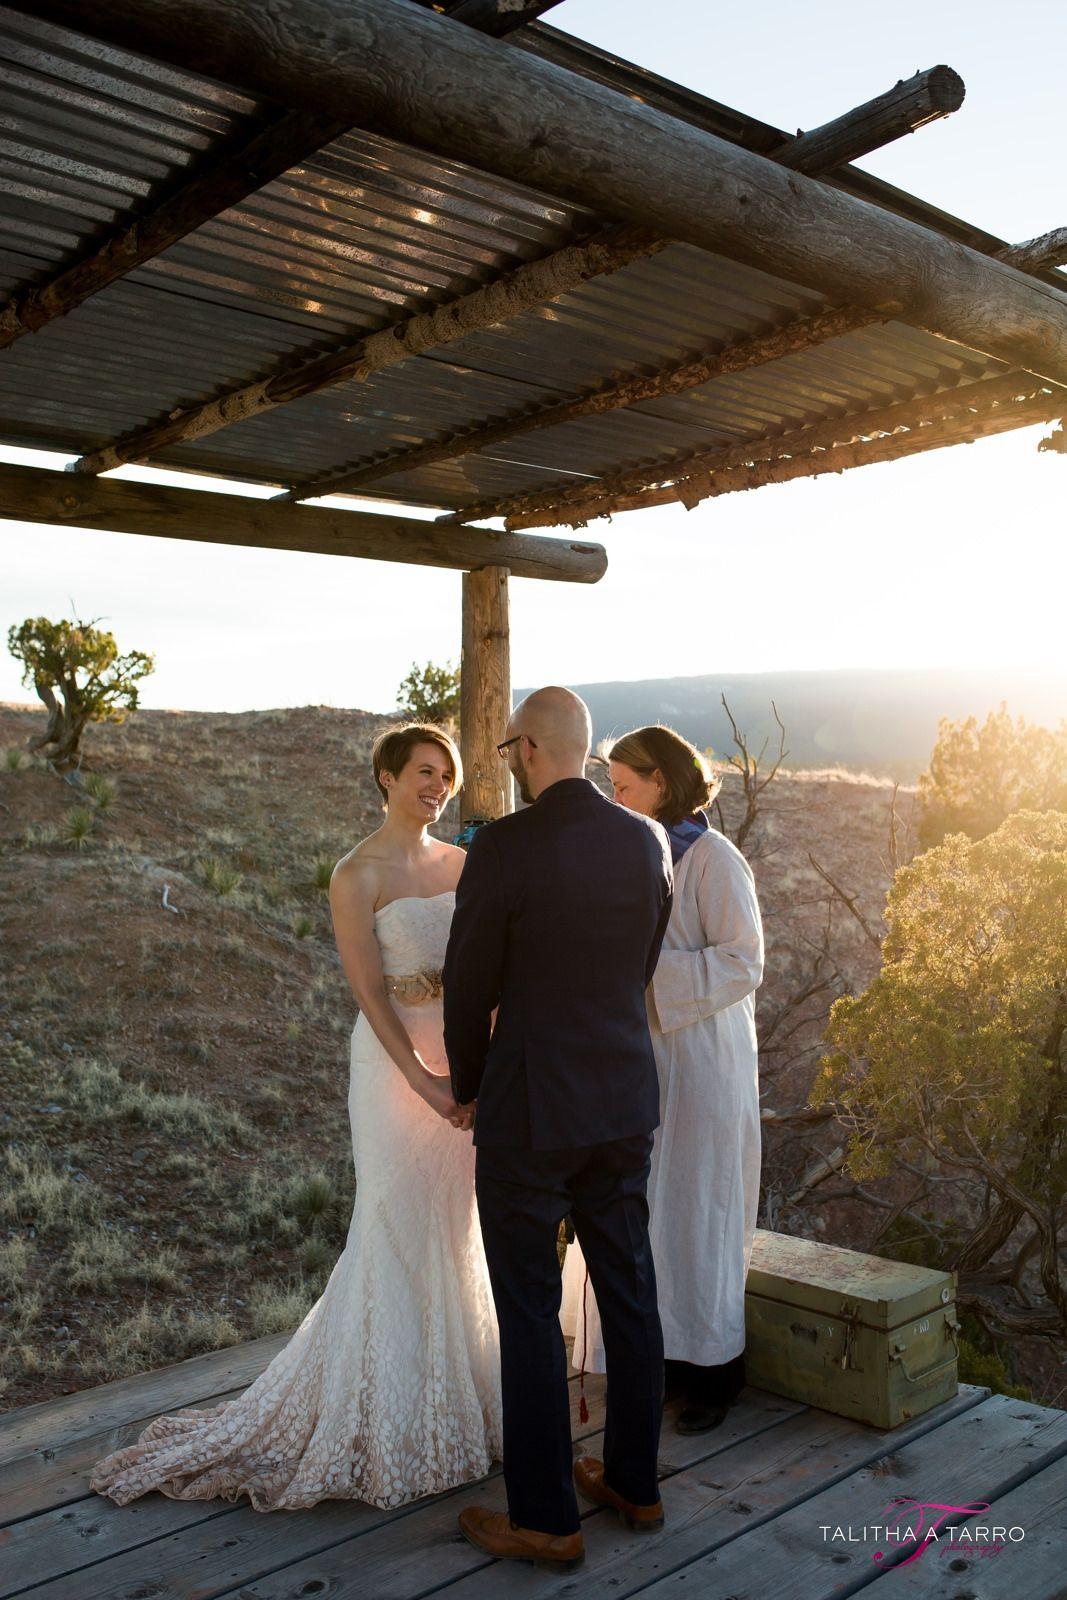 A Little Santa Fe Wedding Non Traditional Wedding Small Wedding Ceremony Elopement Outdoor Santa Fe Wedding Small Weddings Ceremony Nontraditional Wedding